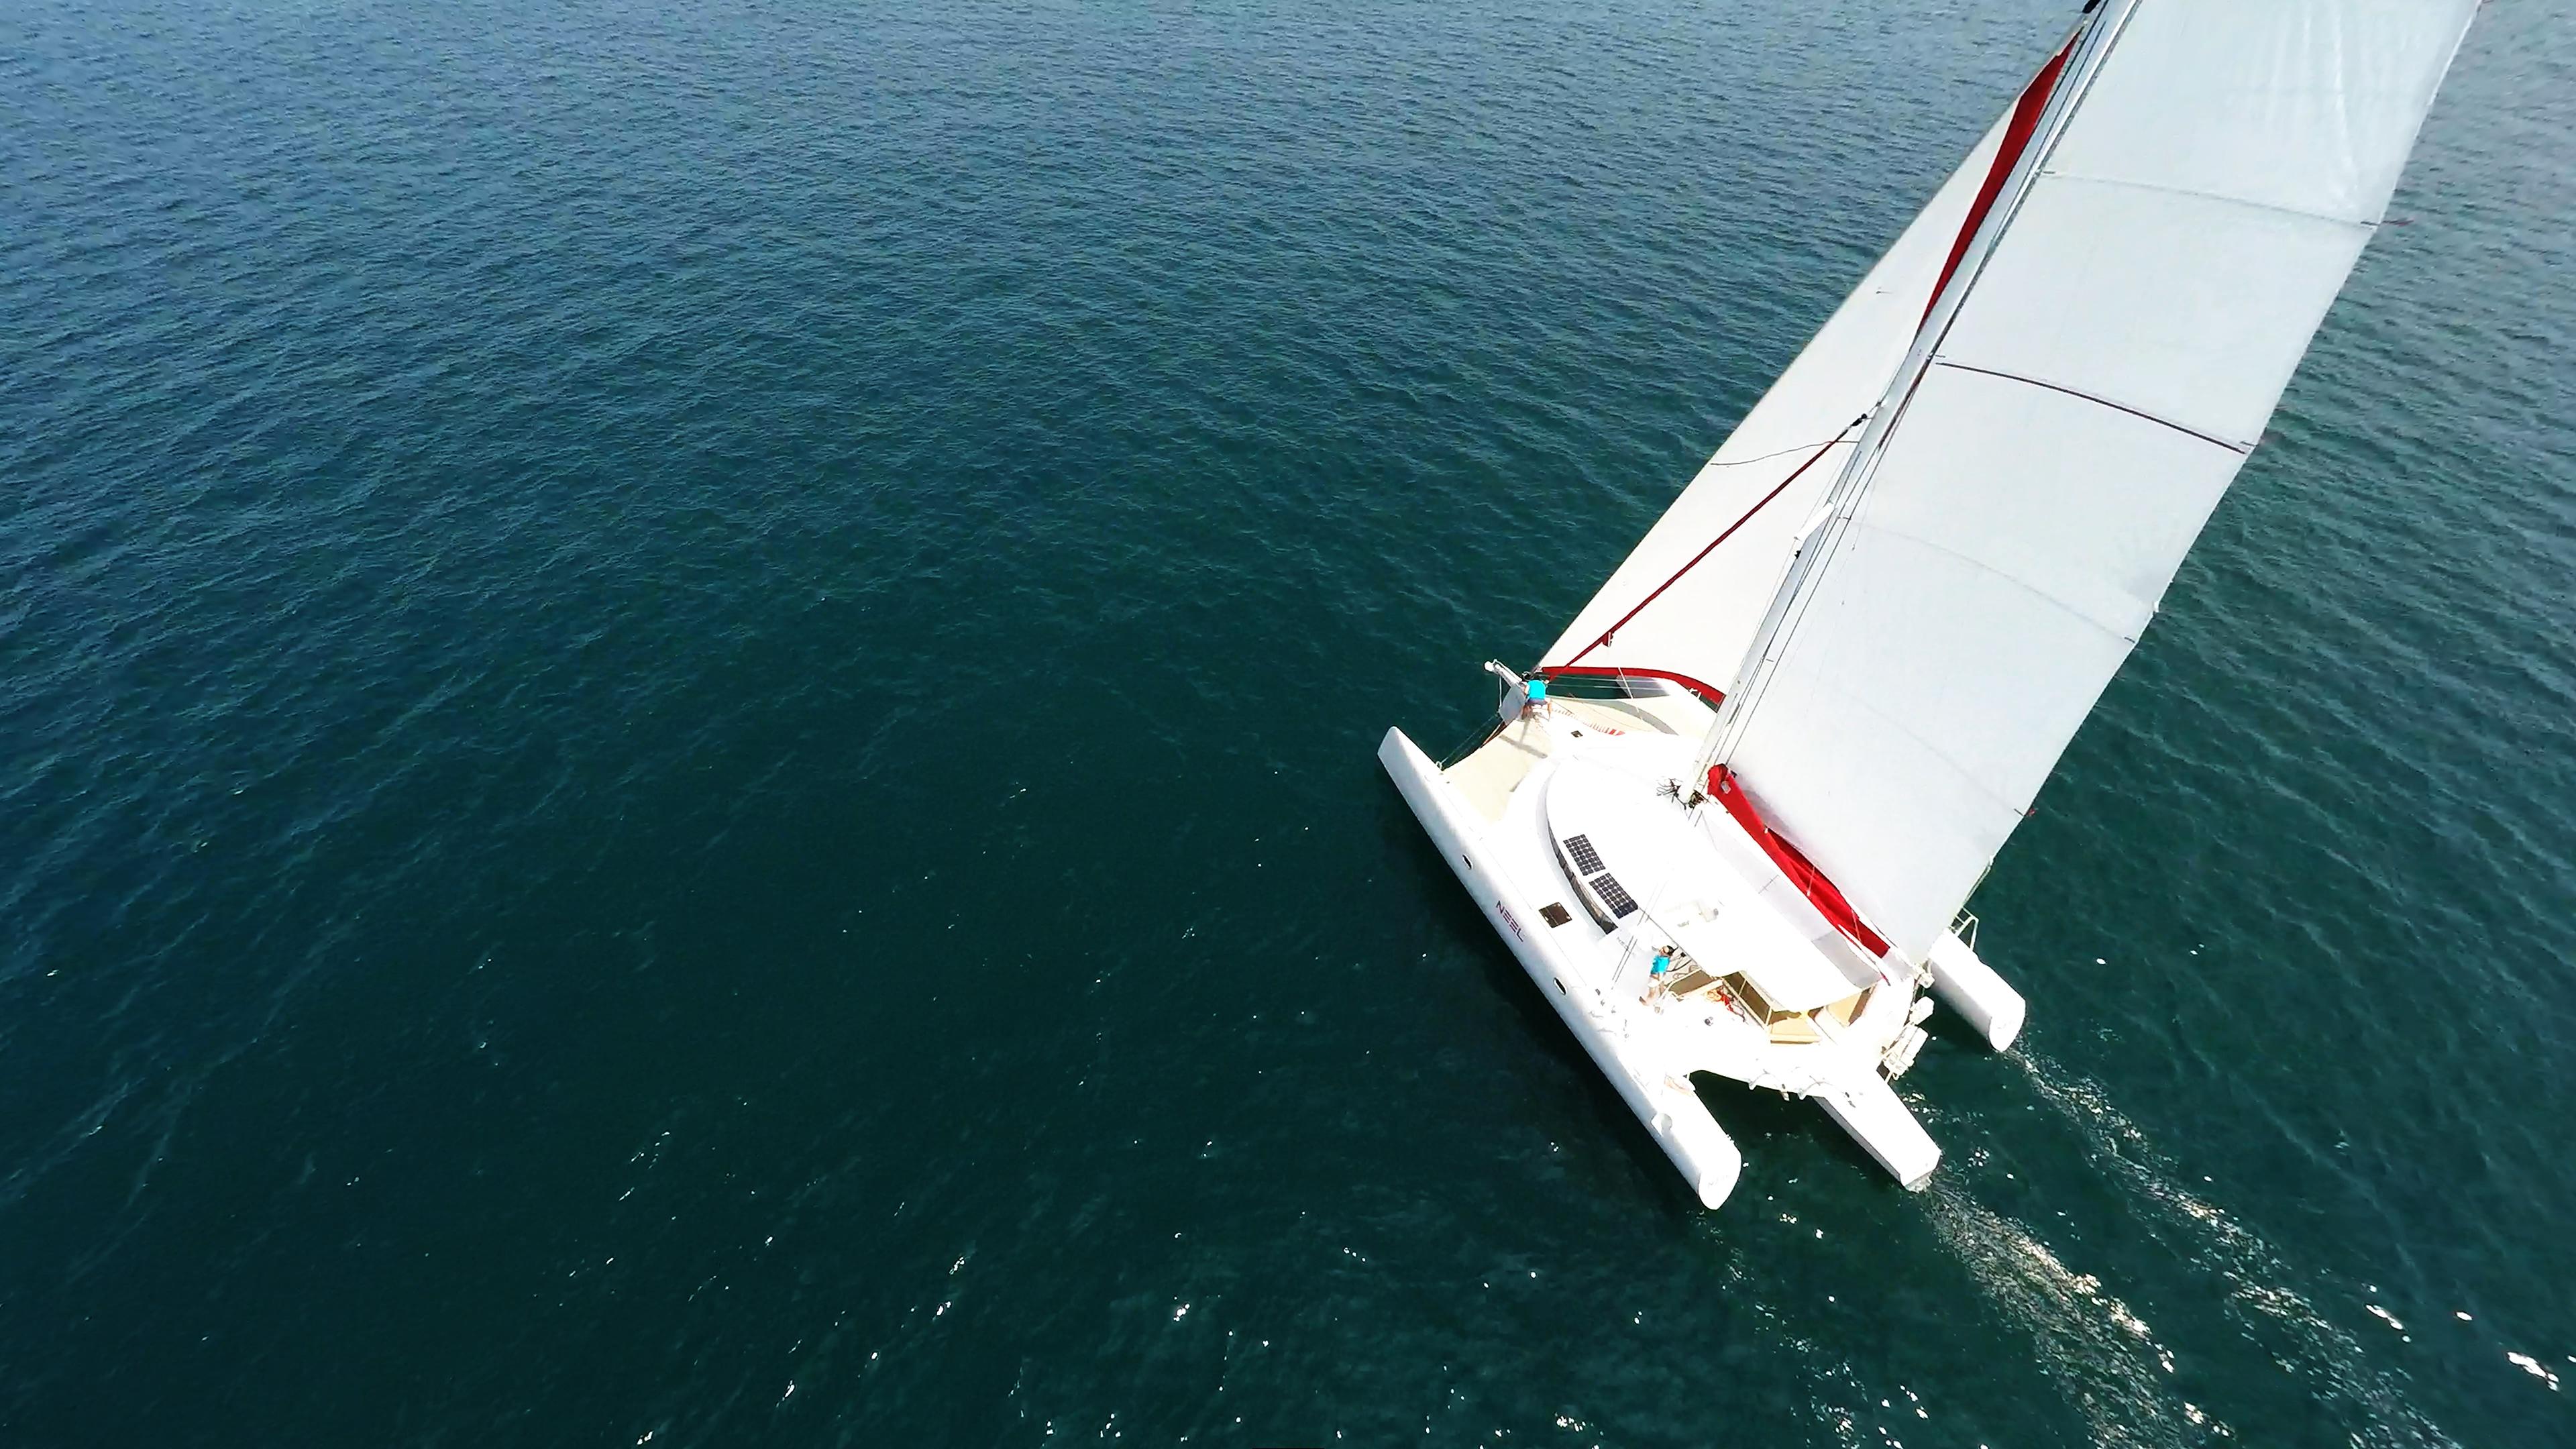 trimarano randa albero appiattita vela yacht